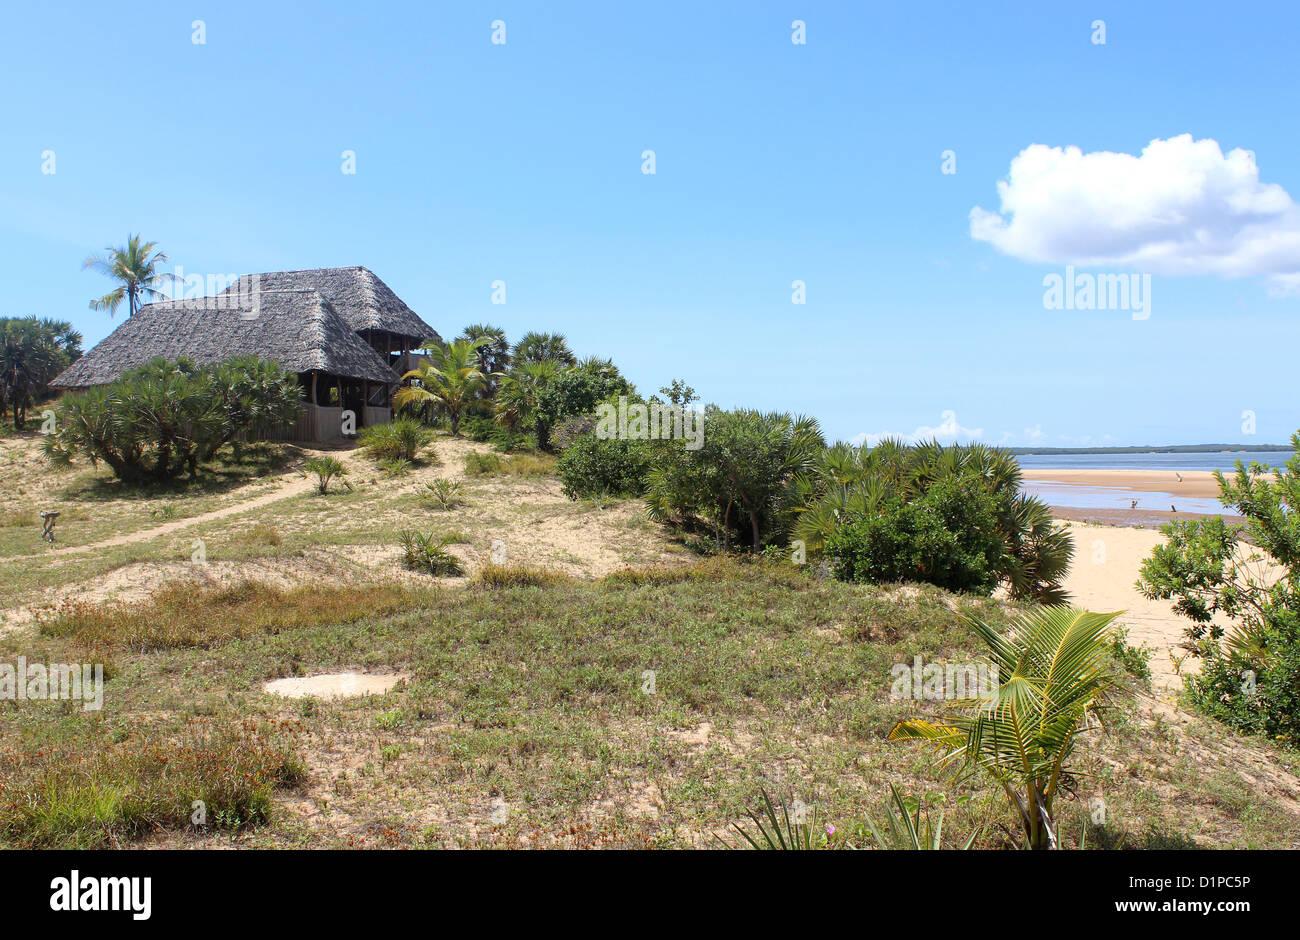 Kipungani Explorer beach Resort, palm reetgedeckten Banda Gasthäuser & Pensionen, Insel Lamu, Kenia, Stockbild